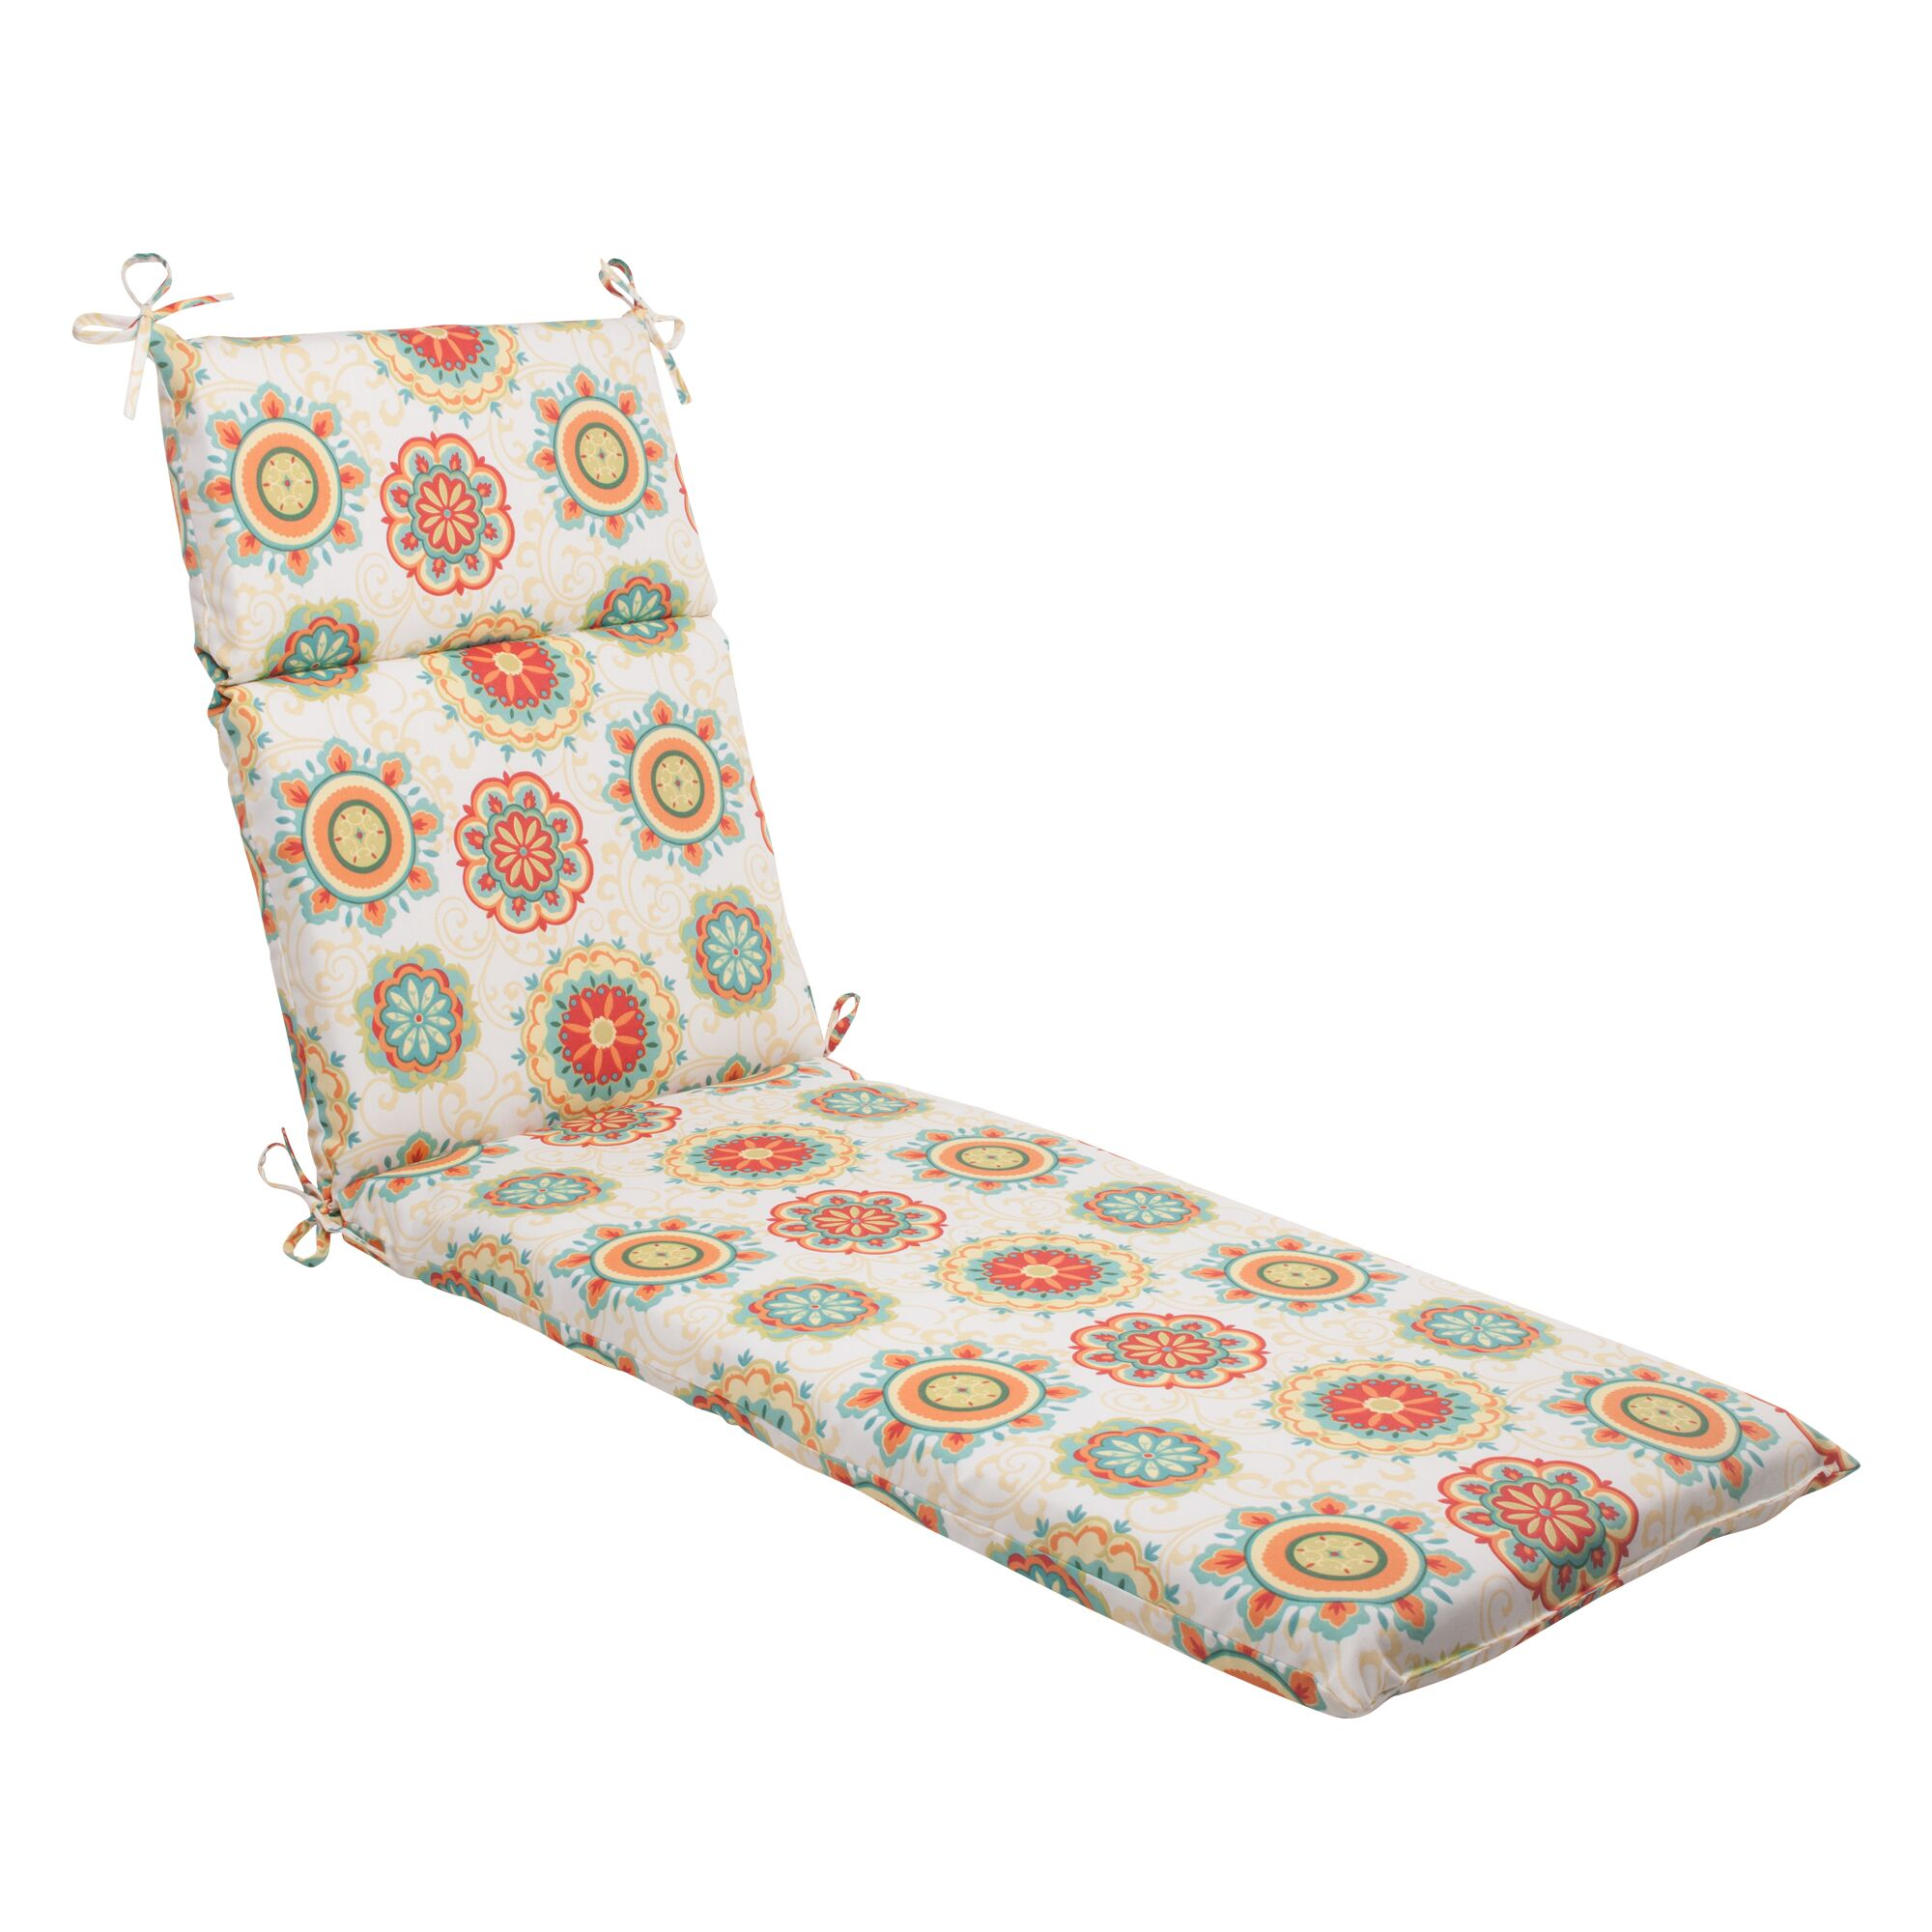 Joliet Indoor/Outdoor Chaise Lounge Cushion